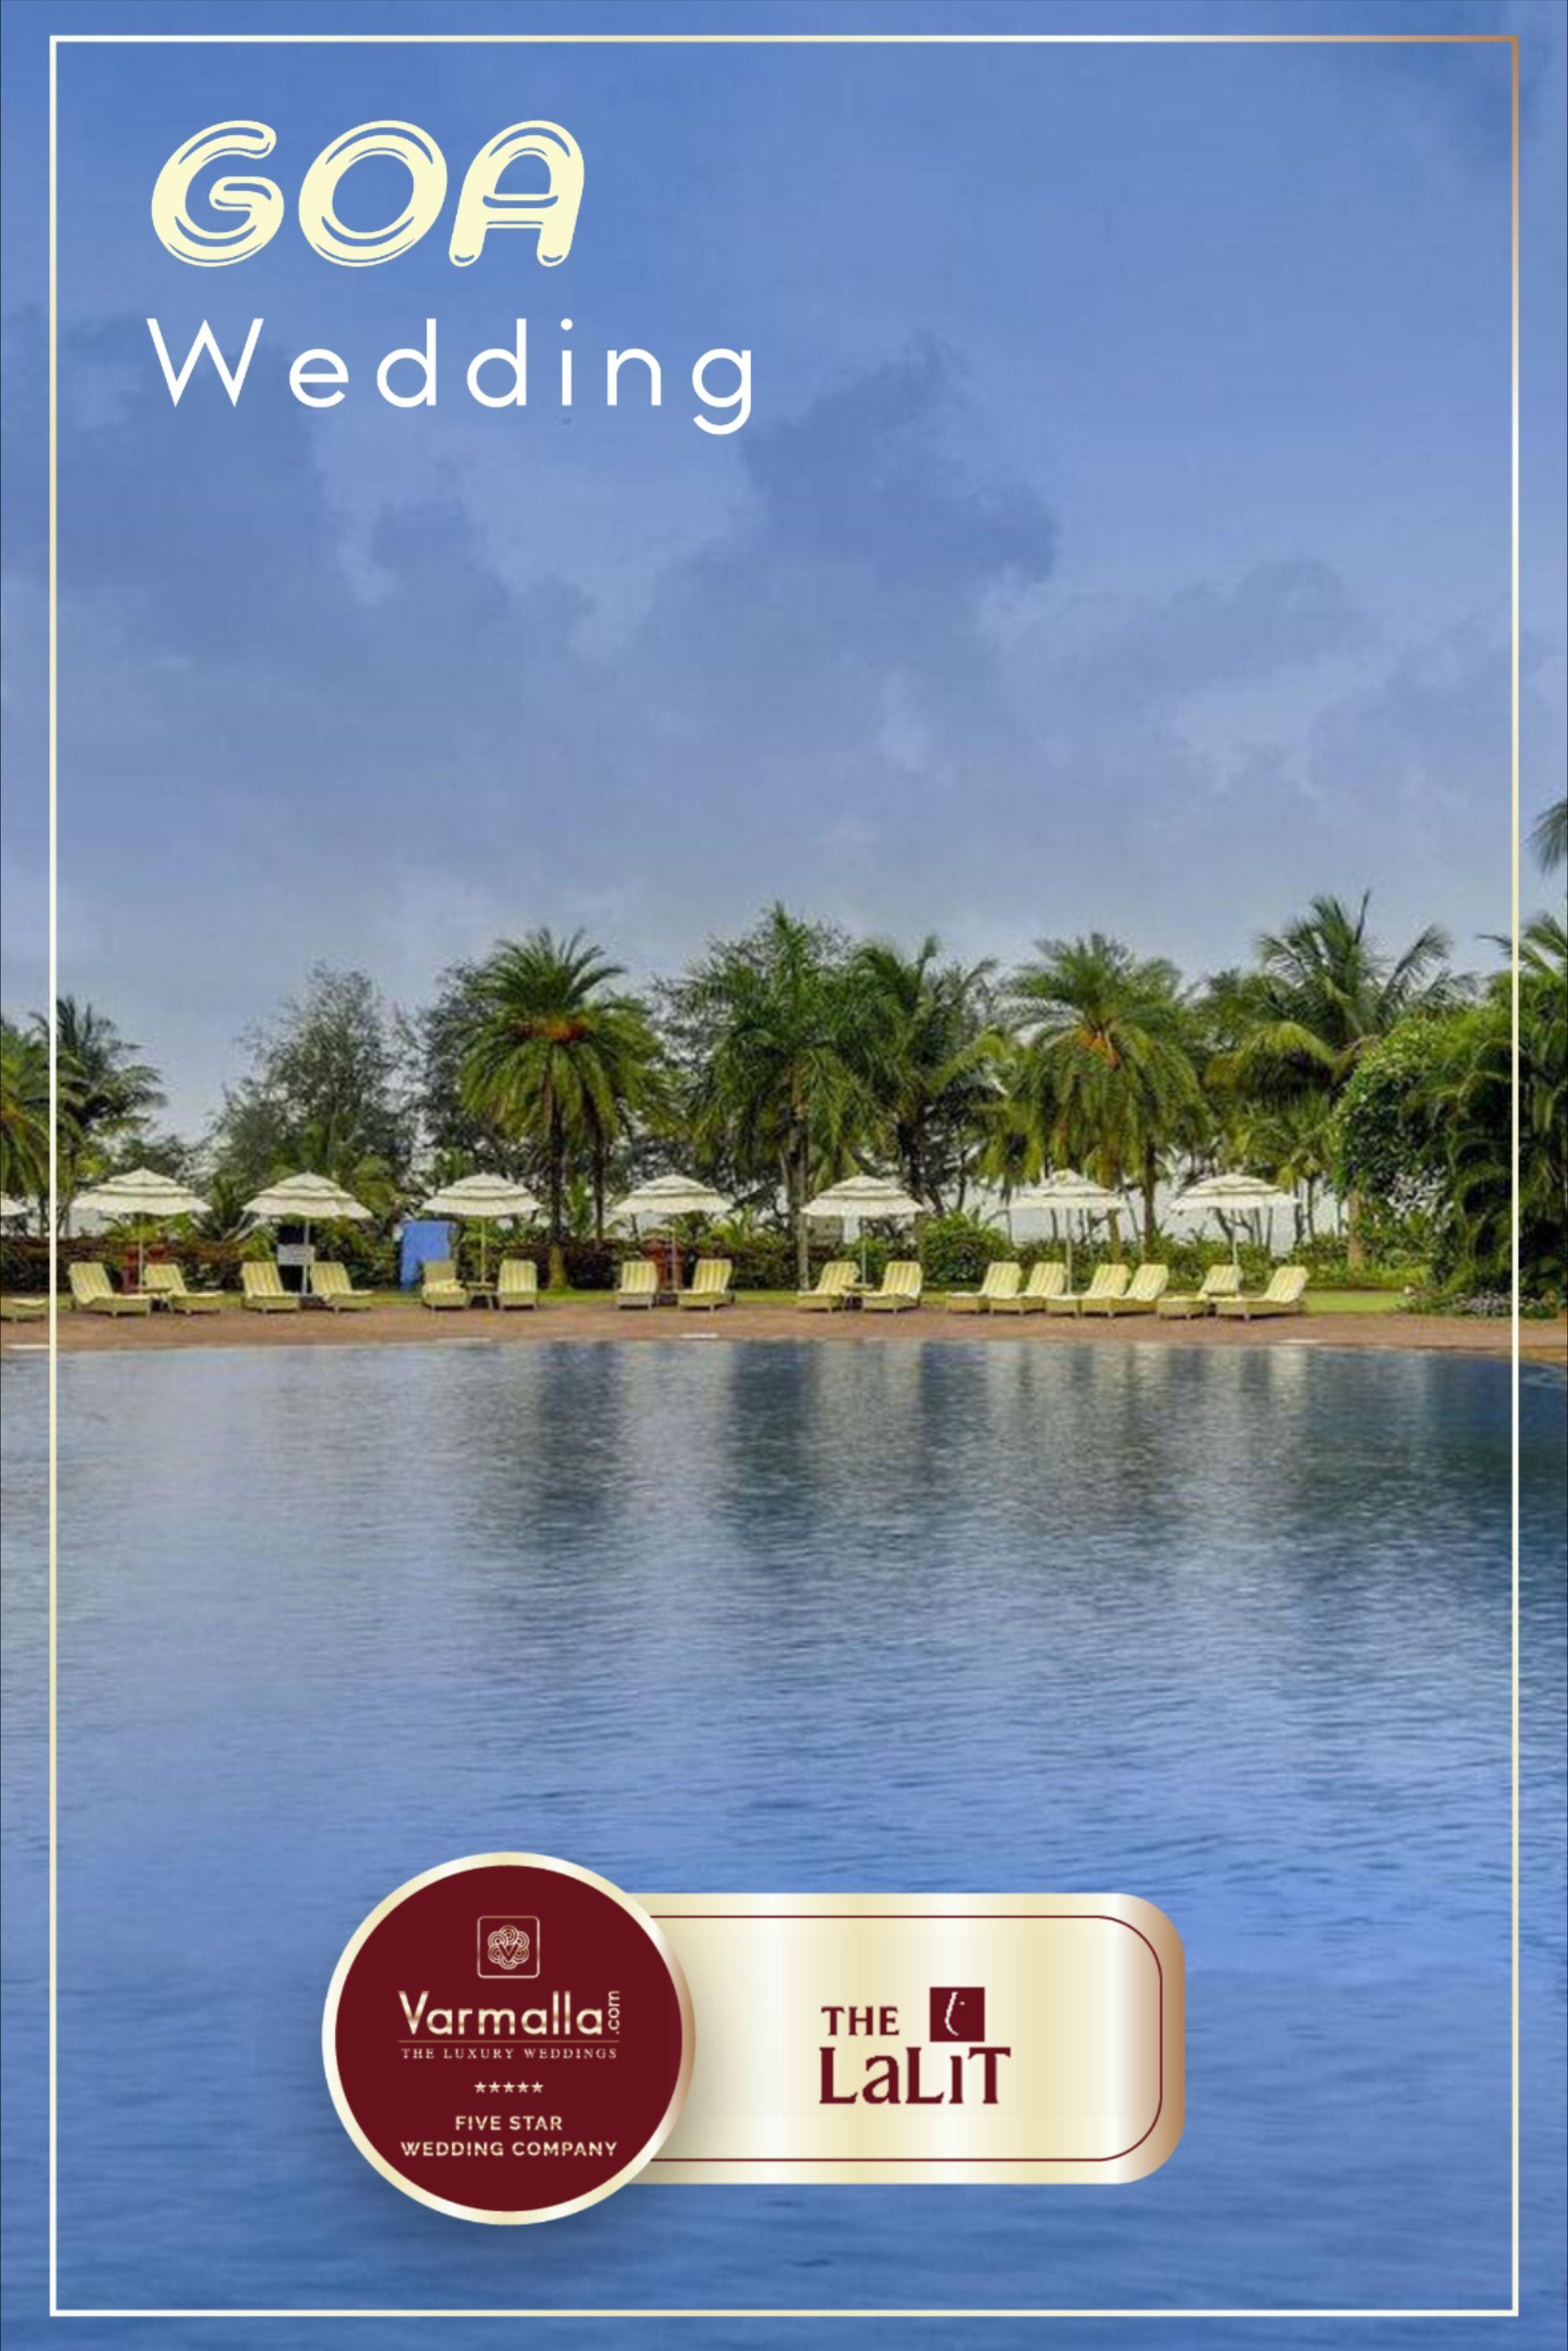 It has a tremendous swimming pool for your enjoyment...#thelalit #lalithotel #thelalitgoa #hyattgoa #tajvivantainpanjimgoa #tajfortaguadaresort&spagoa #tajmahal #tajpalace #goa #goaindia #goataco #weddinginvitationcards #honeymoon #honeymoonpackages #bridallehenga #bridalmakeup #bridalmehndidesign #bridalmehndi #Bridalsaree #bridaljewellery #bride #indianbride #bridegroom #eventmanagement #weddingplanner #weddinginvitationcards #destination #destinationwedding #weddingdecorations#weddinggift